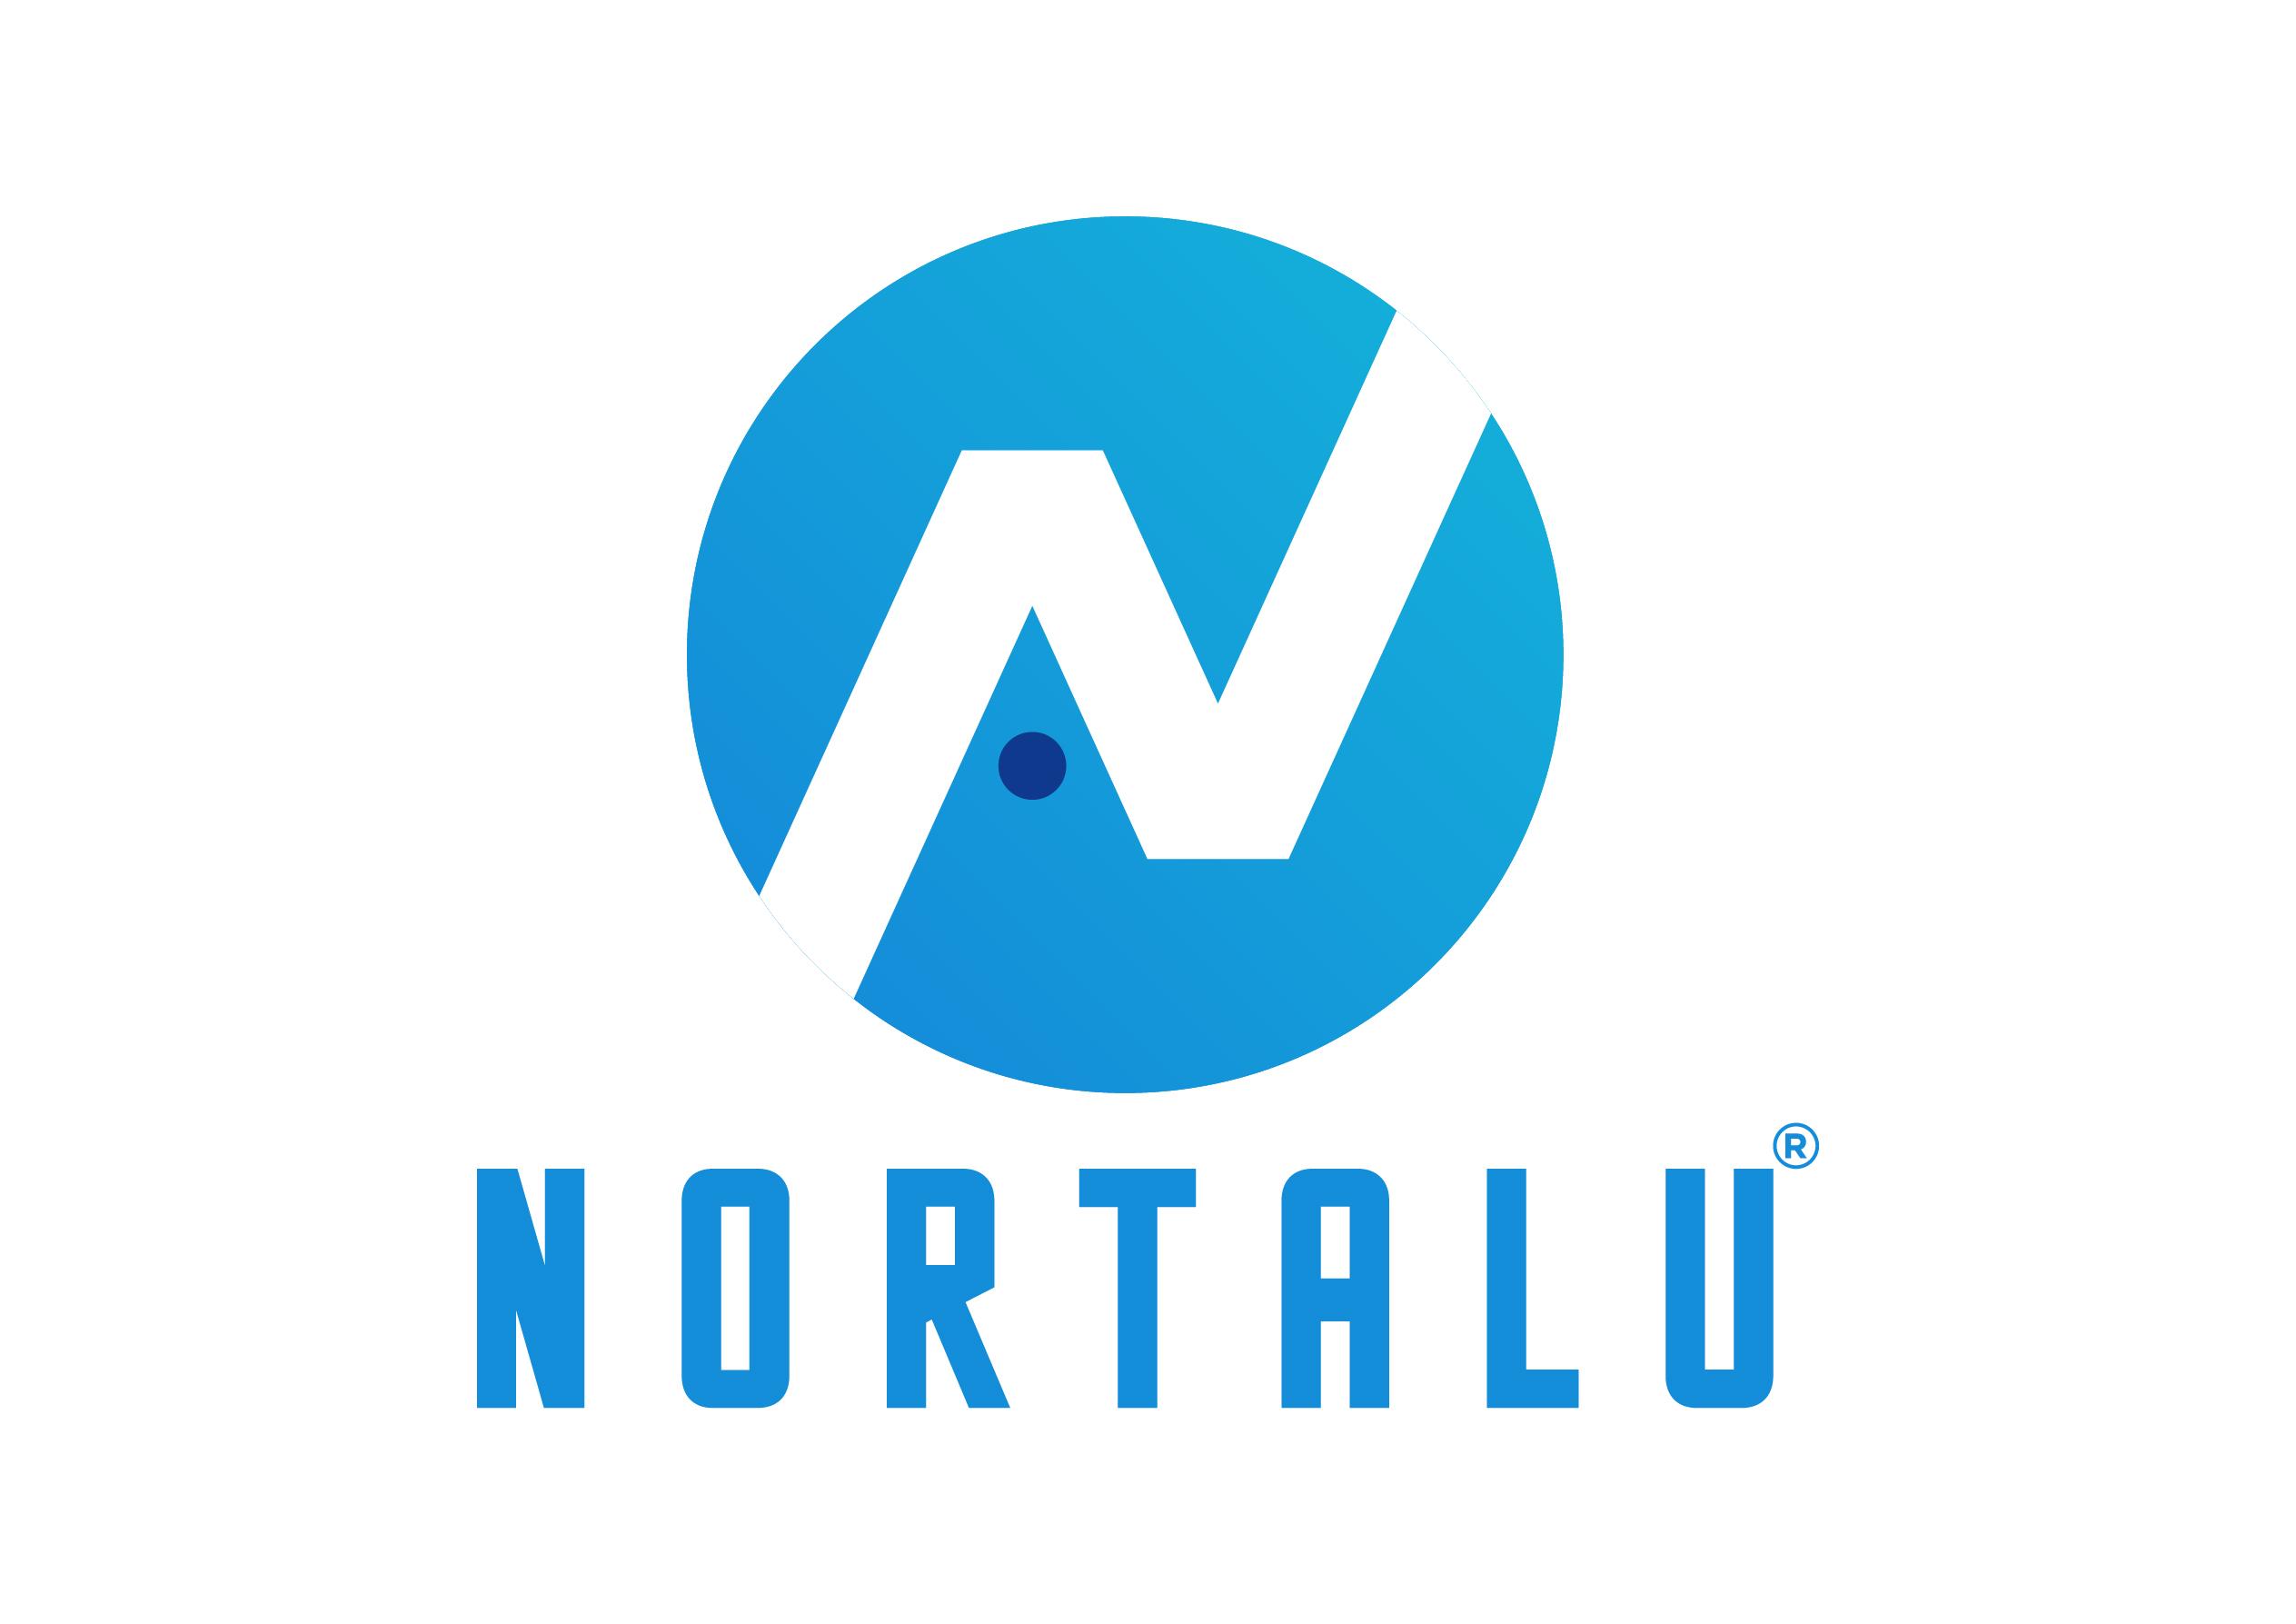 Nortalu